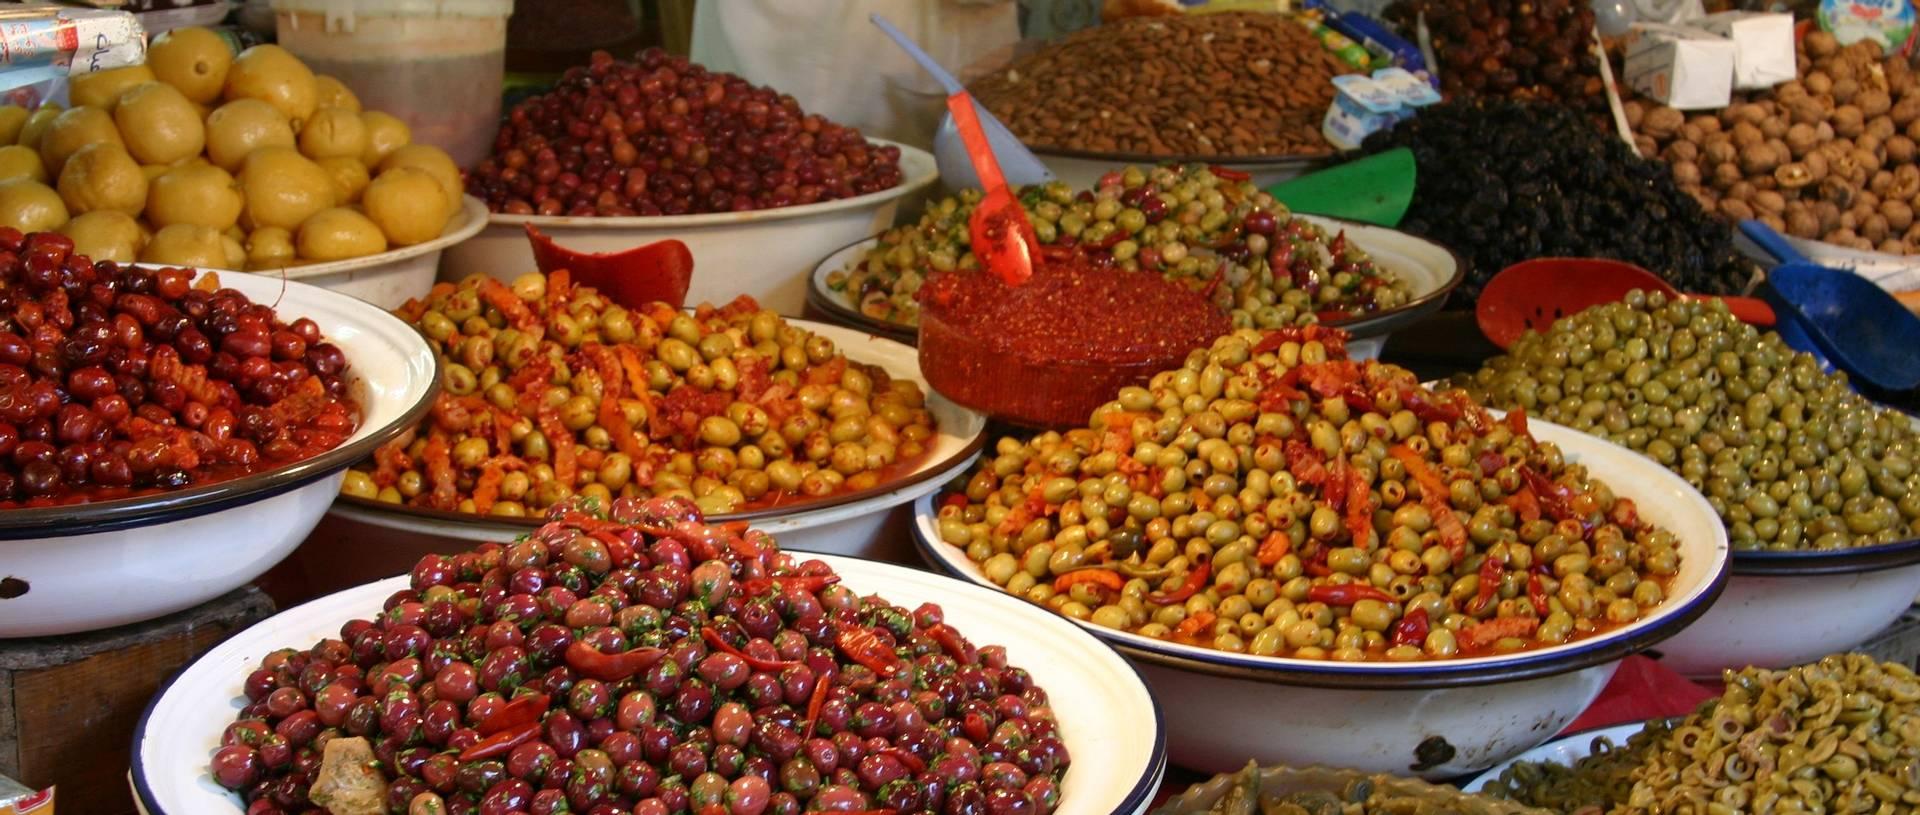 Olives, Fes Medina